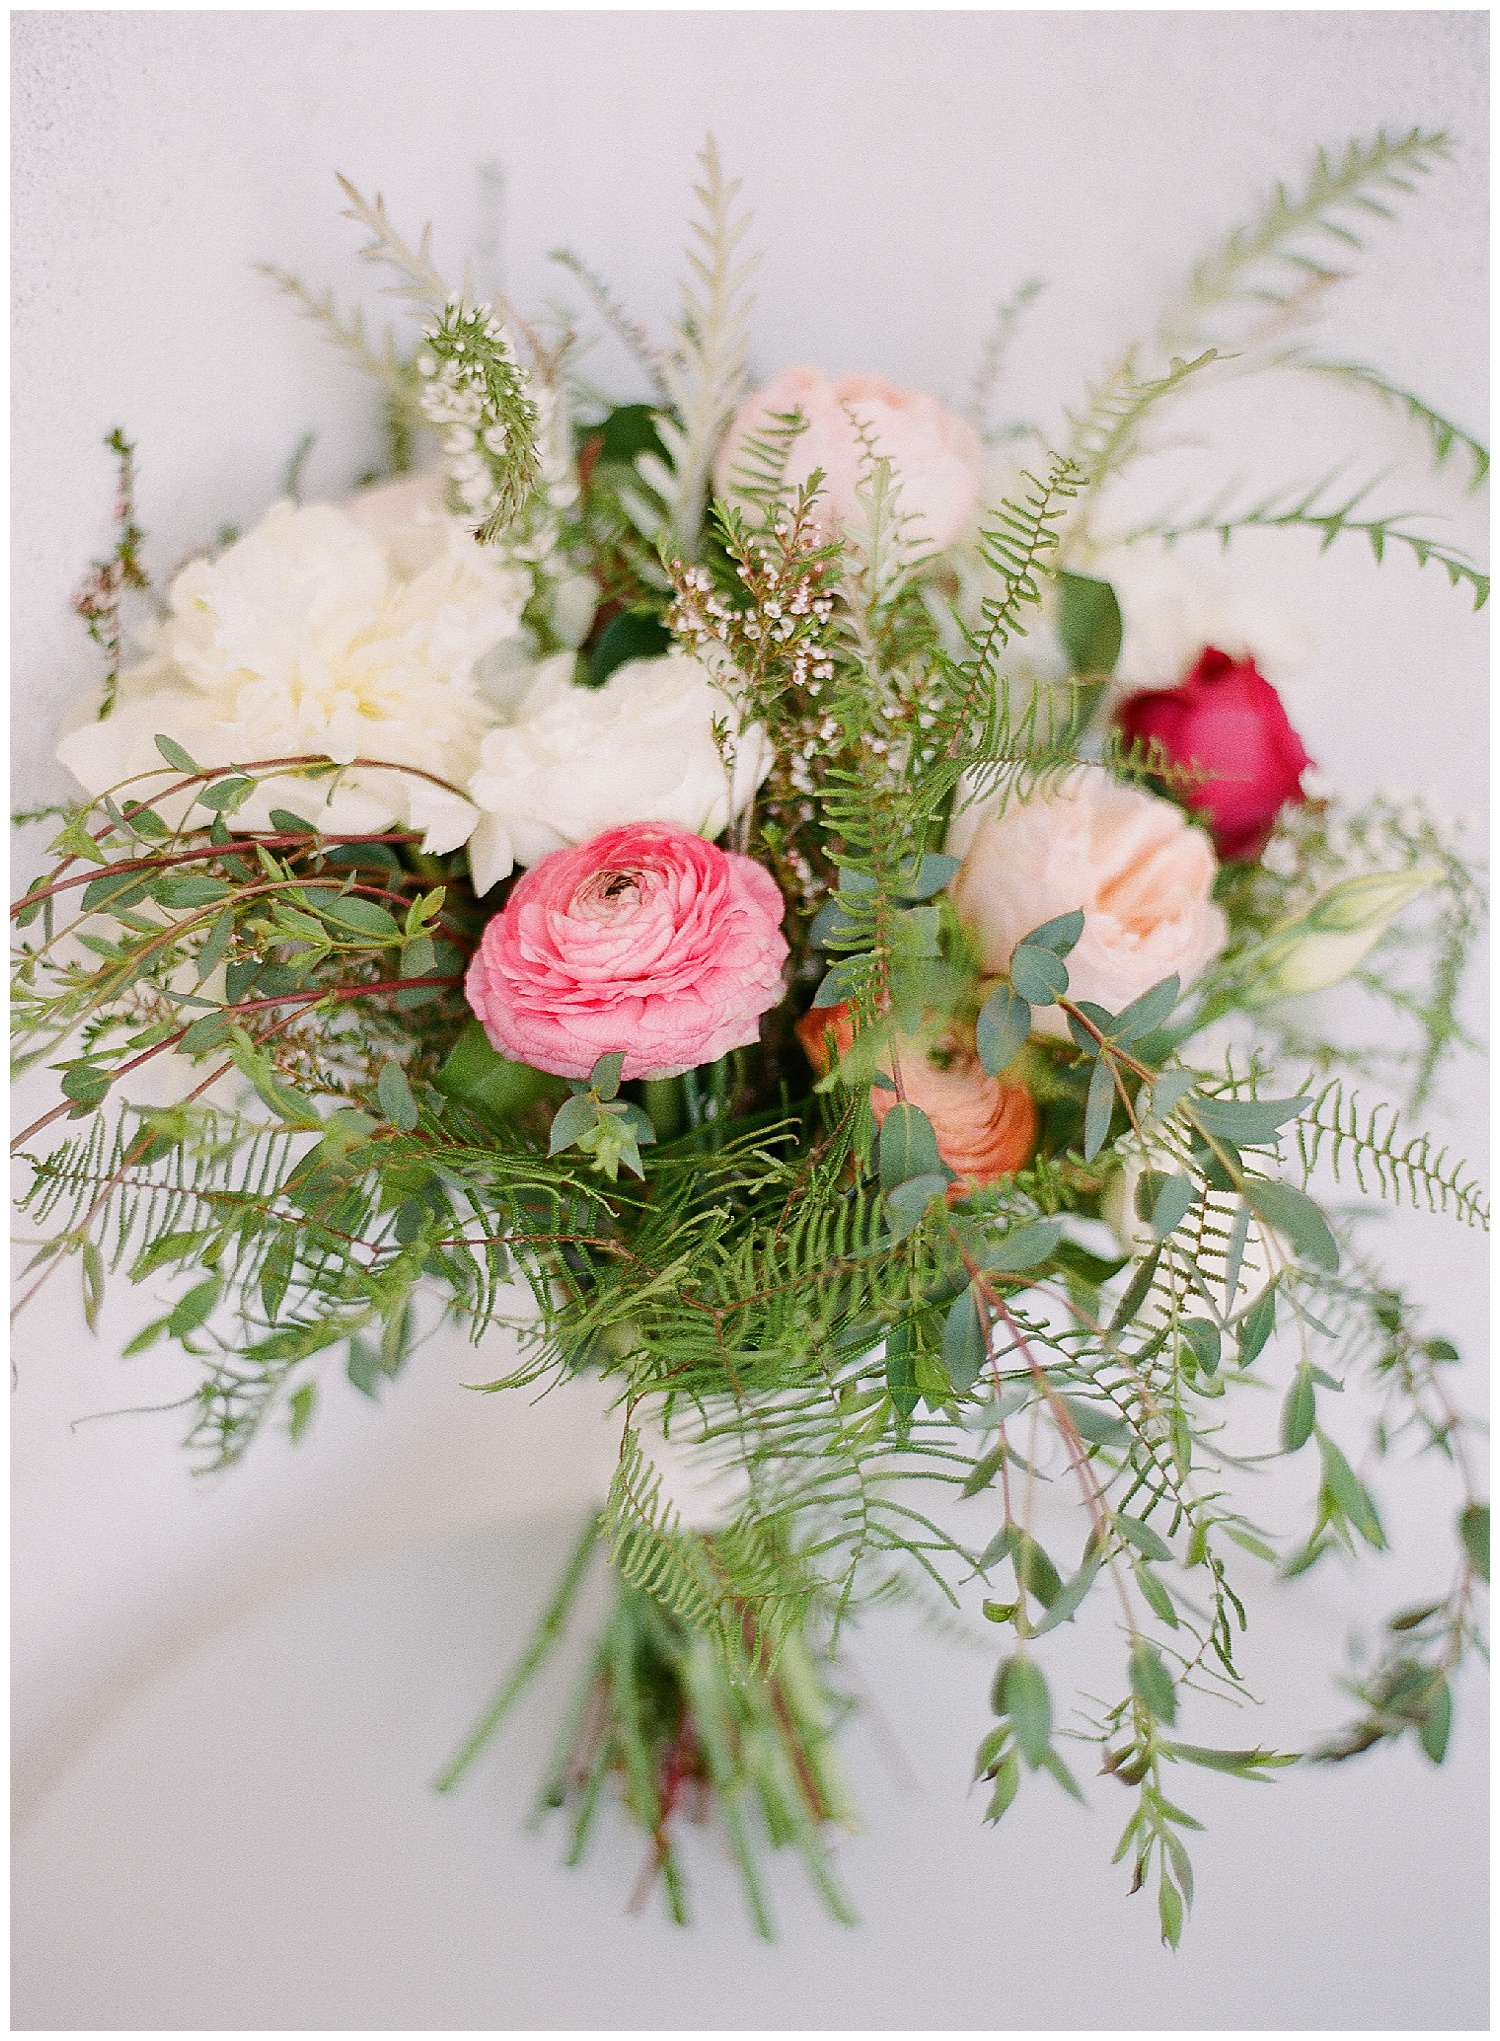 Janine_Licare_Photography_San_Francisco_Wedding_Photographer_Southern_California_0040.jpg